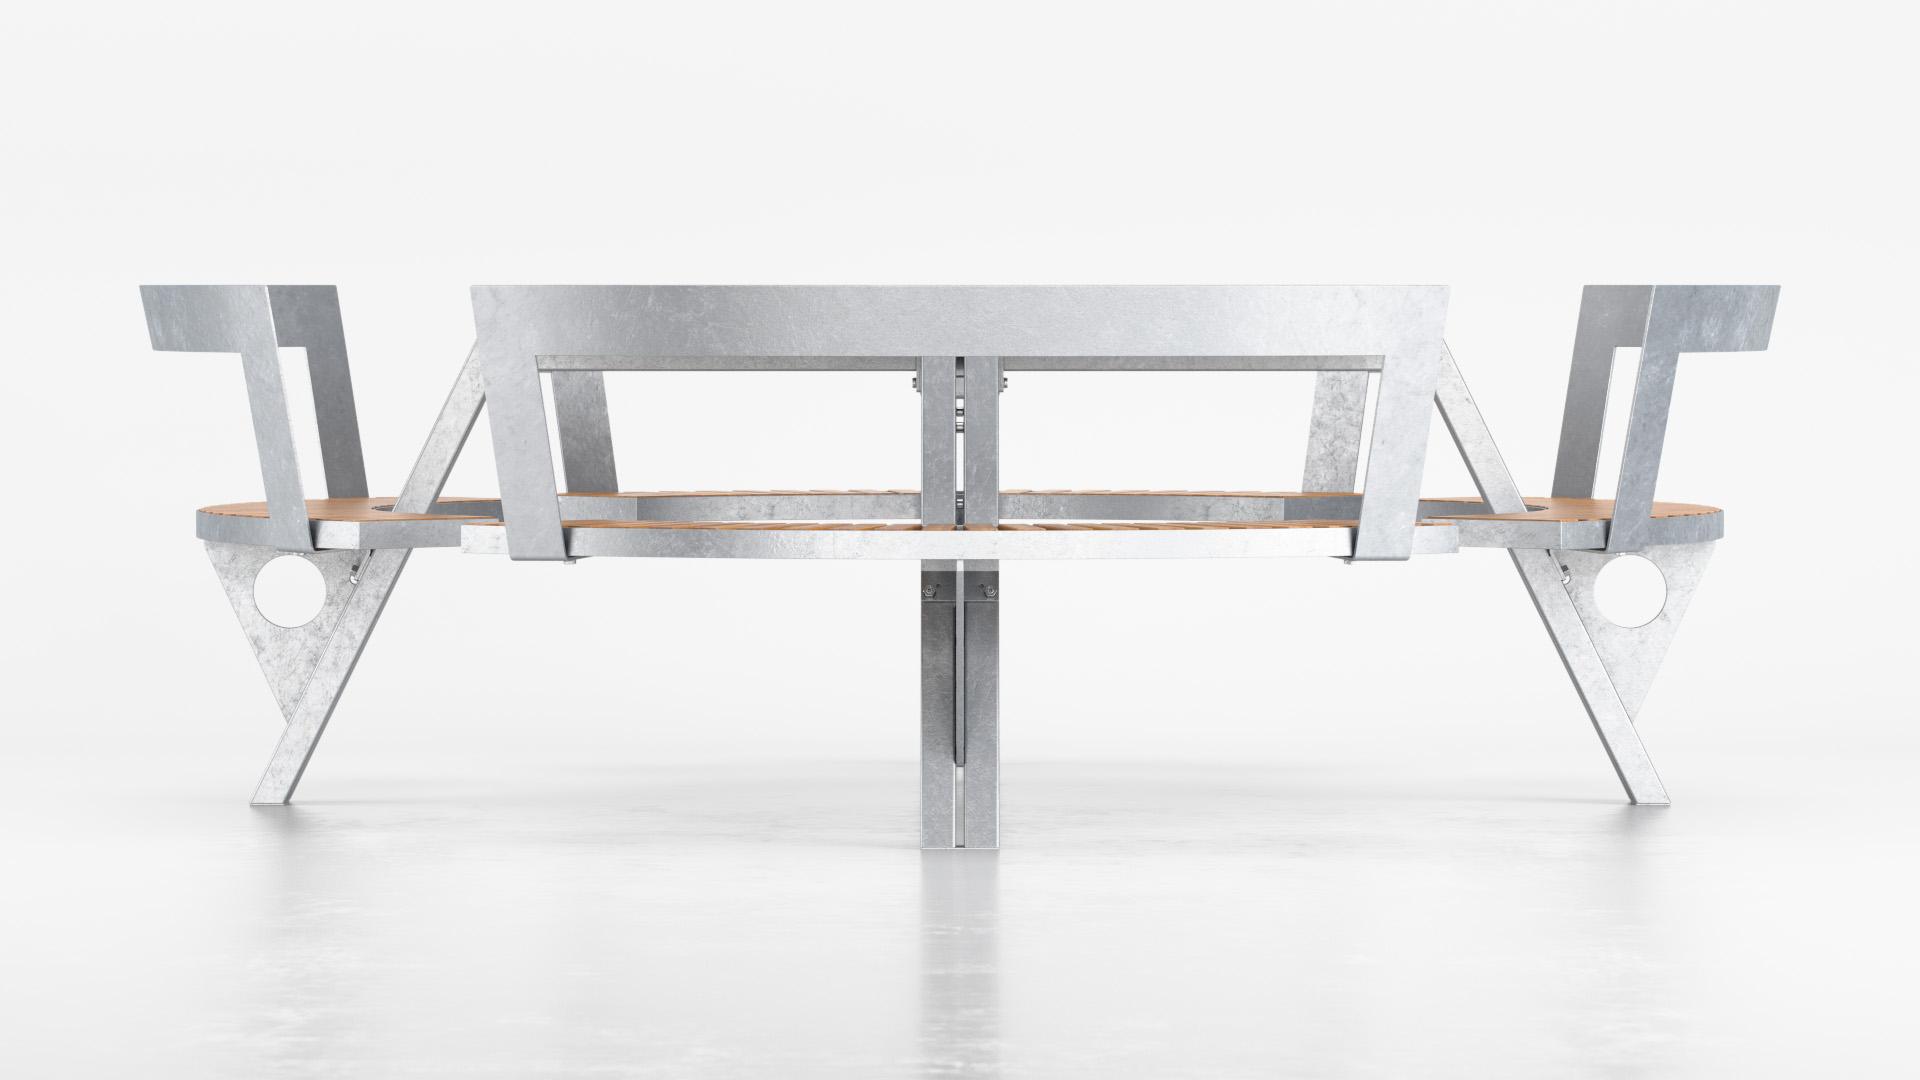 Gargantua_Table_Mode3_WhiteSet_01_0001